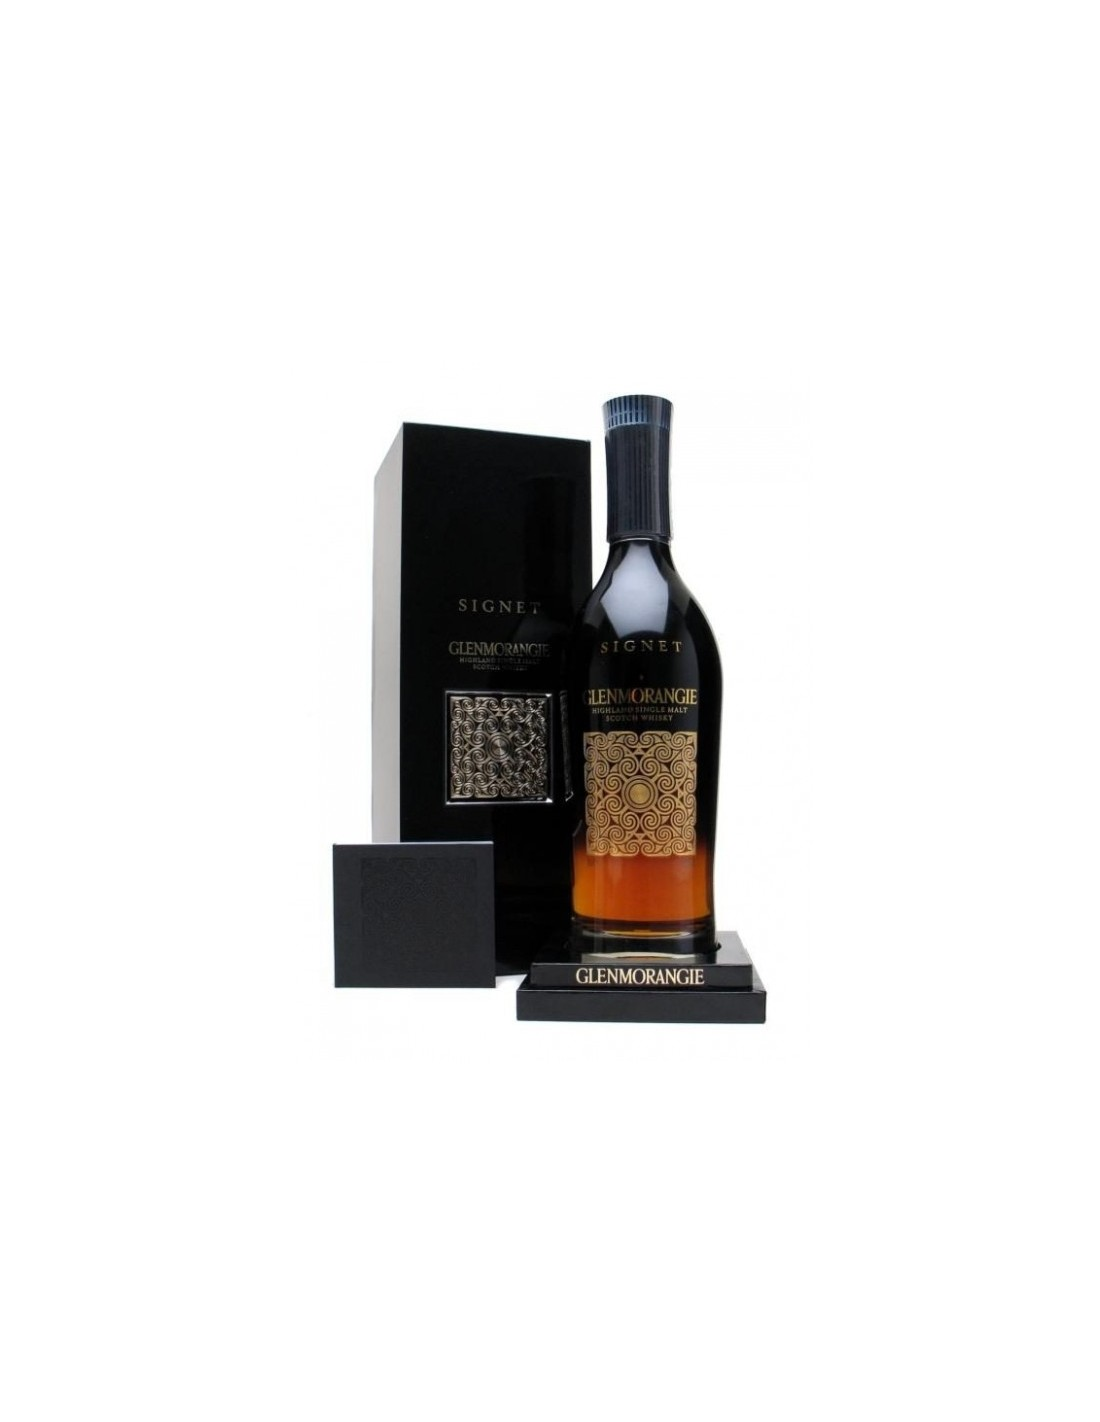 Whisky Glenmorangie Signet, 46% alc., 0.7L, Scotia